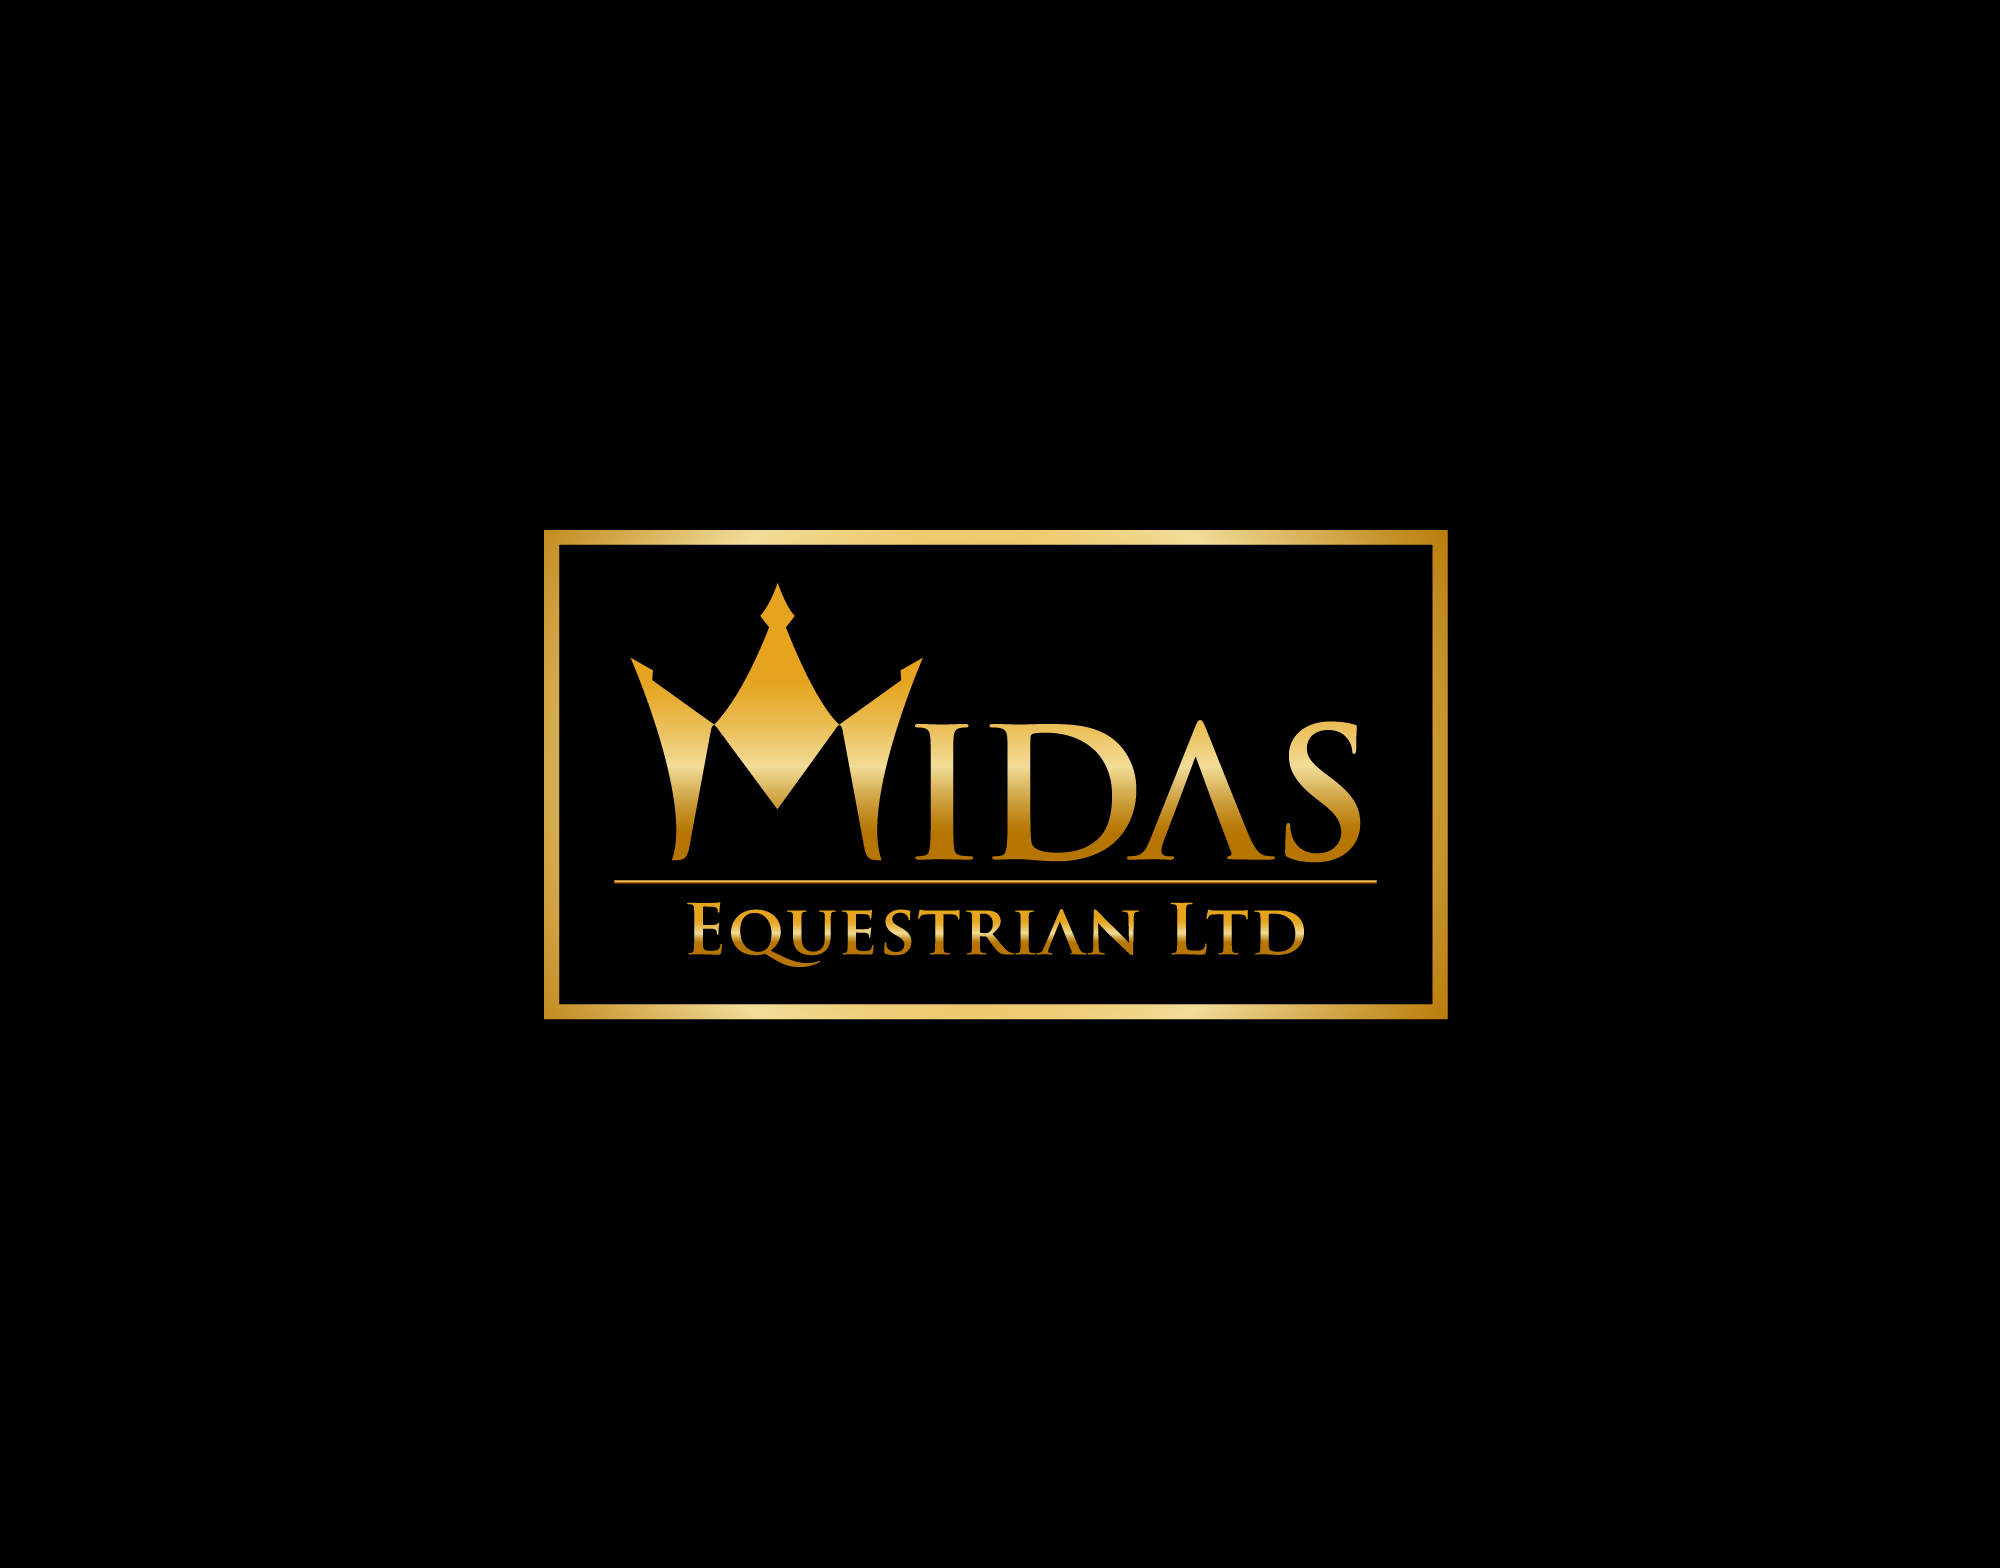 Create the next logo for Midas Equestrian Ltd